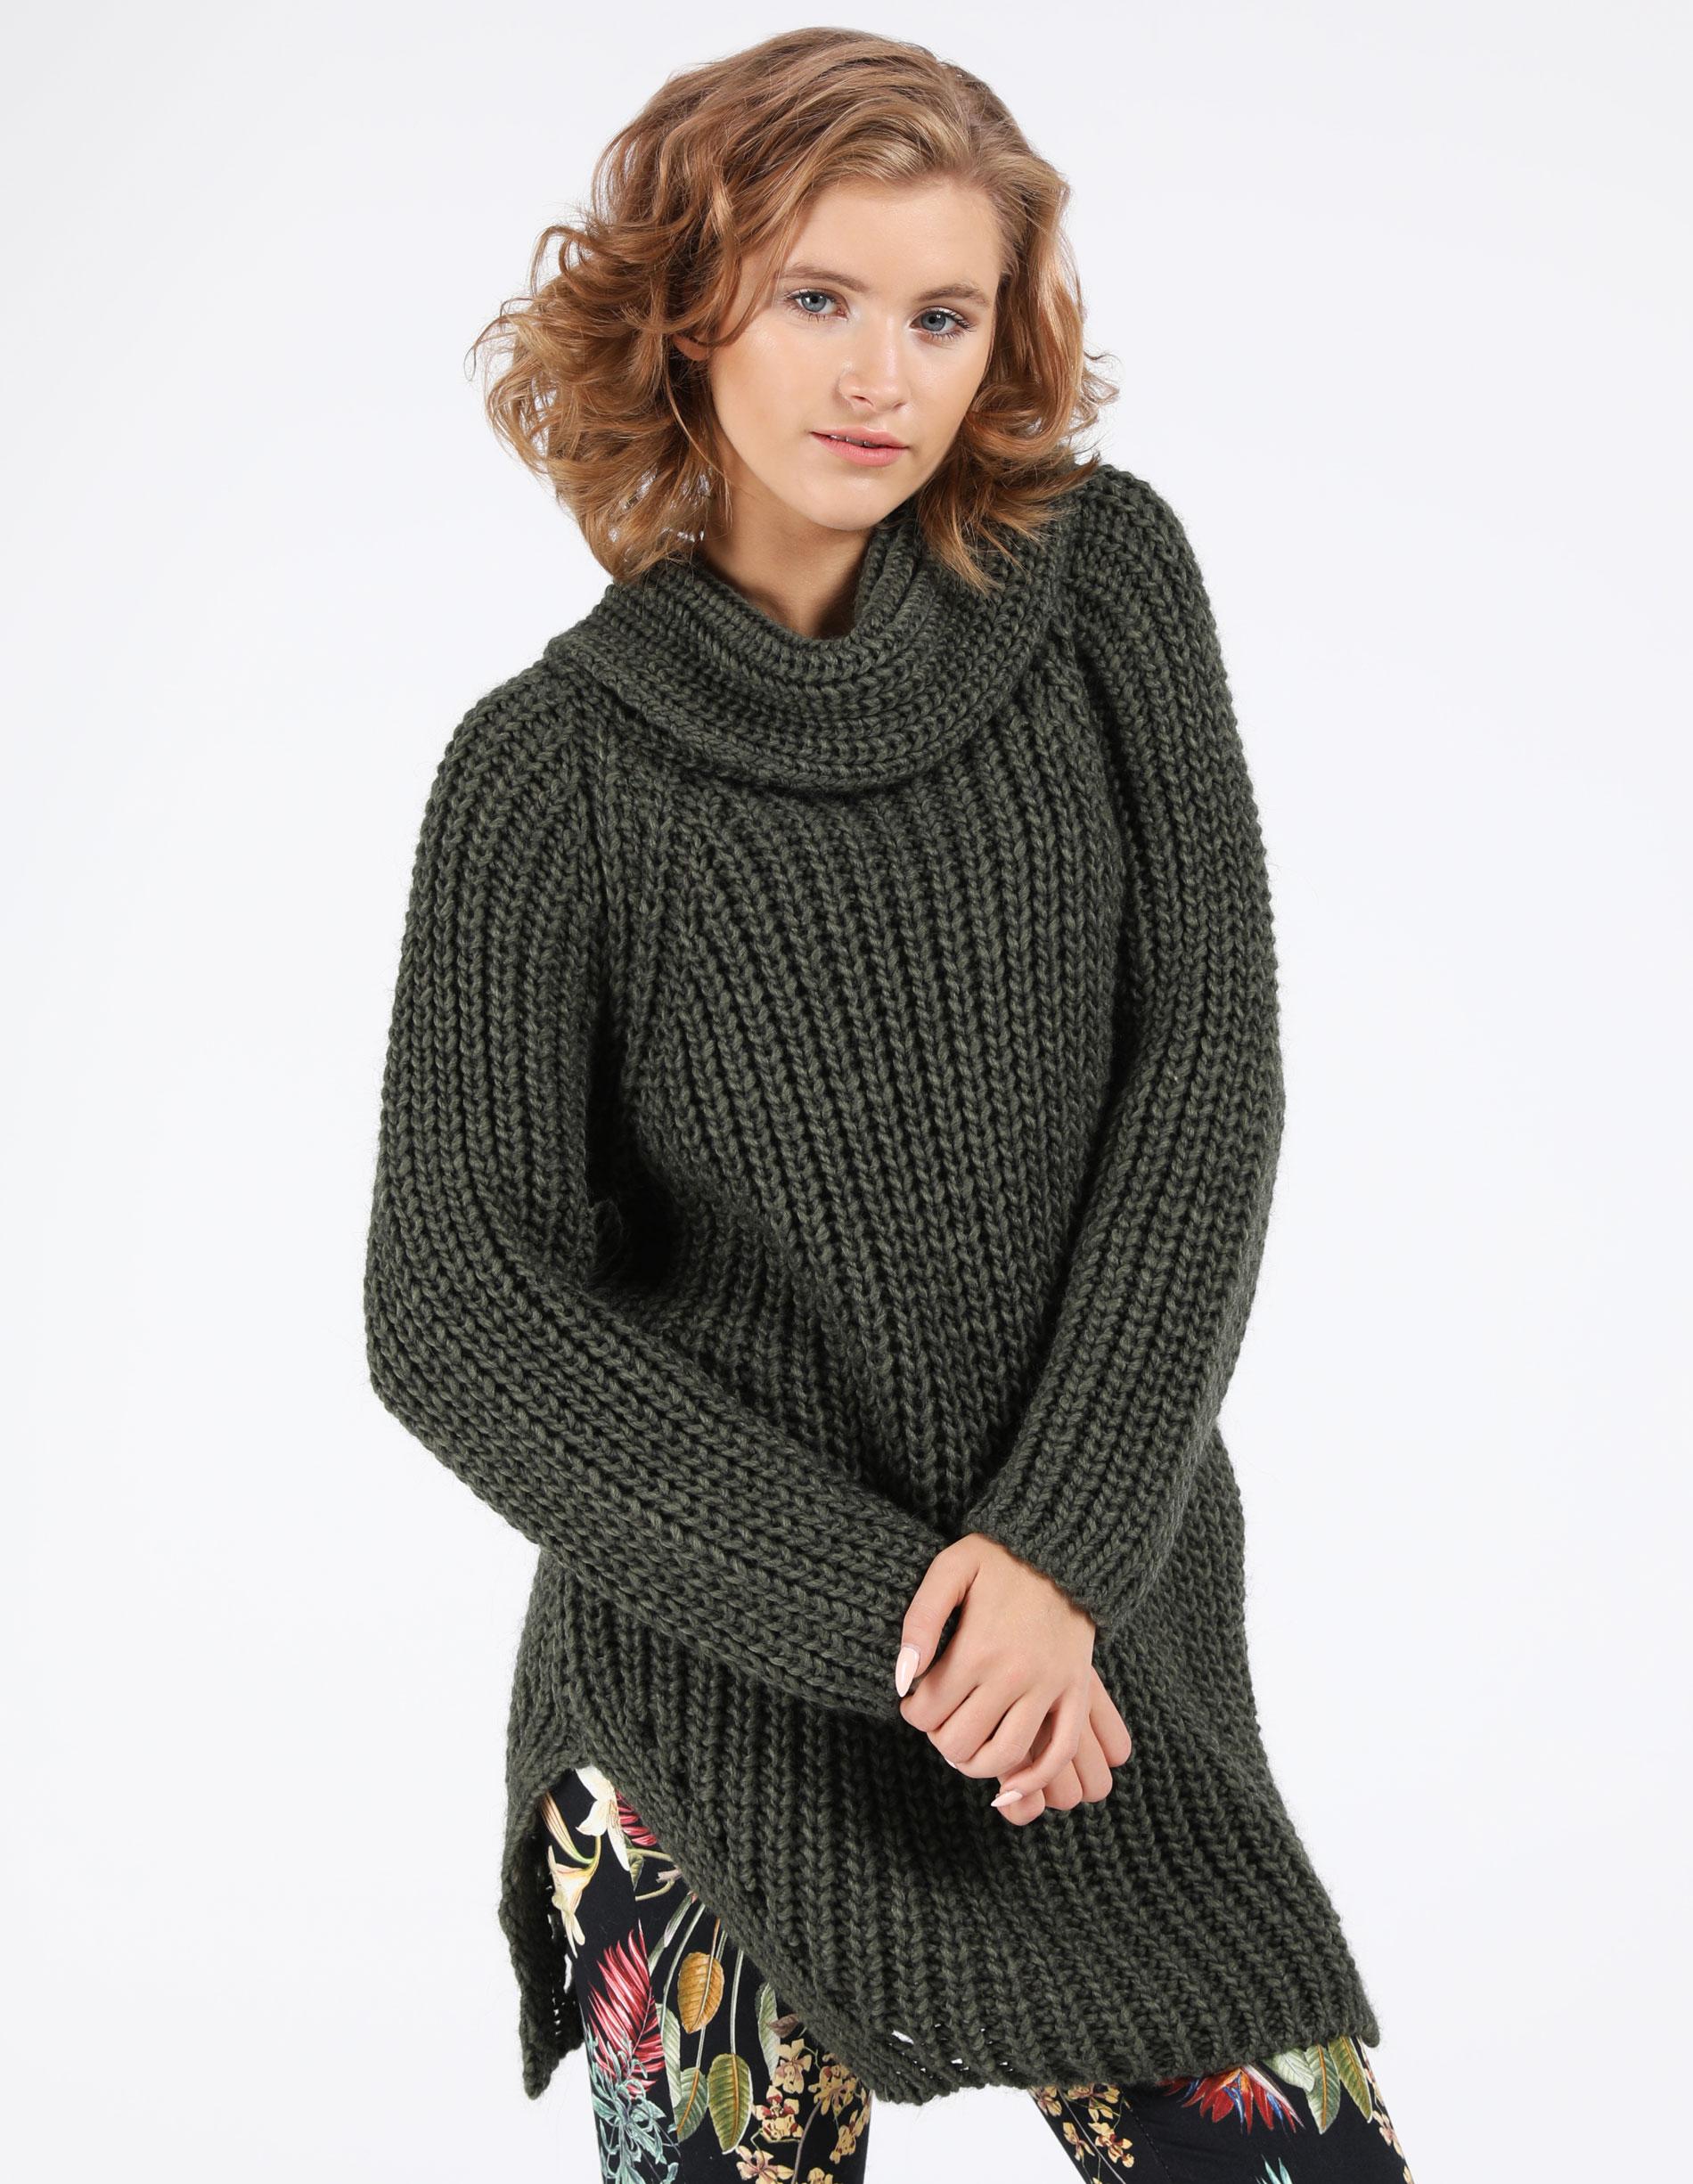 Sweter - 21-3097 MILIT - Unisono